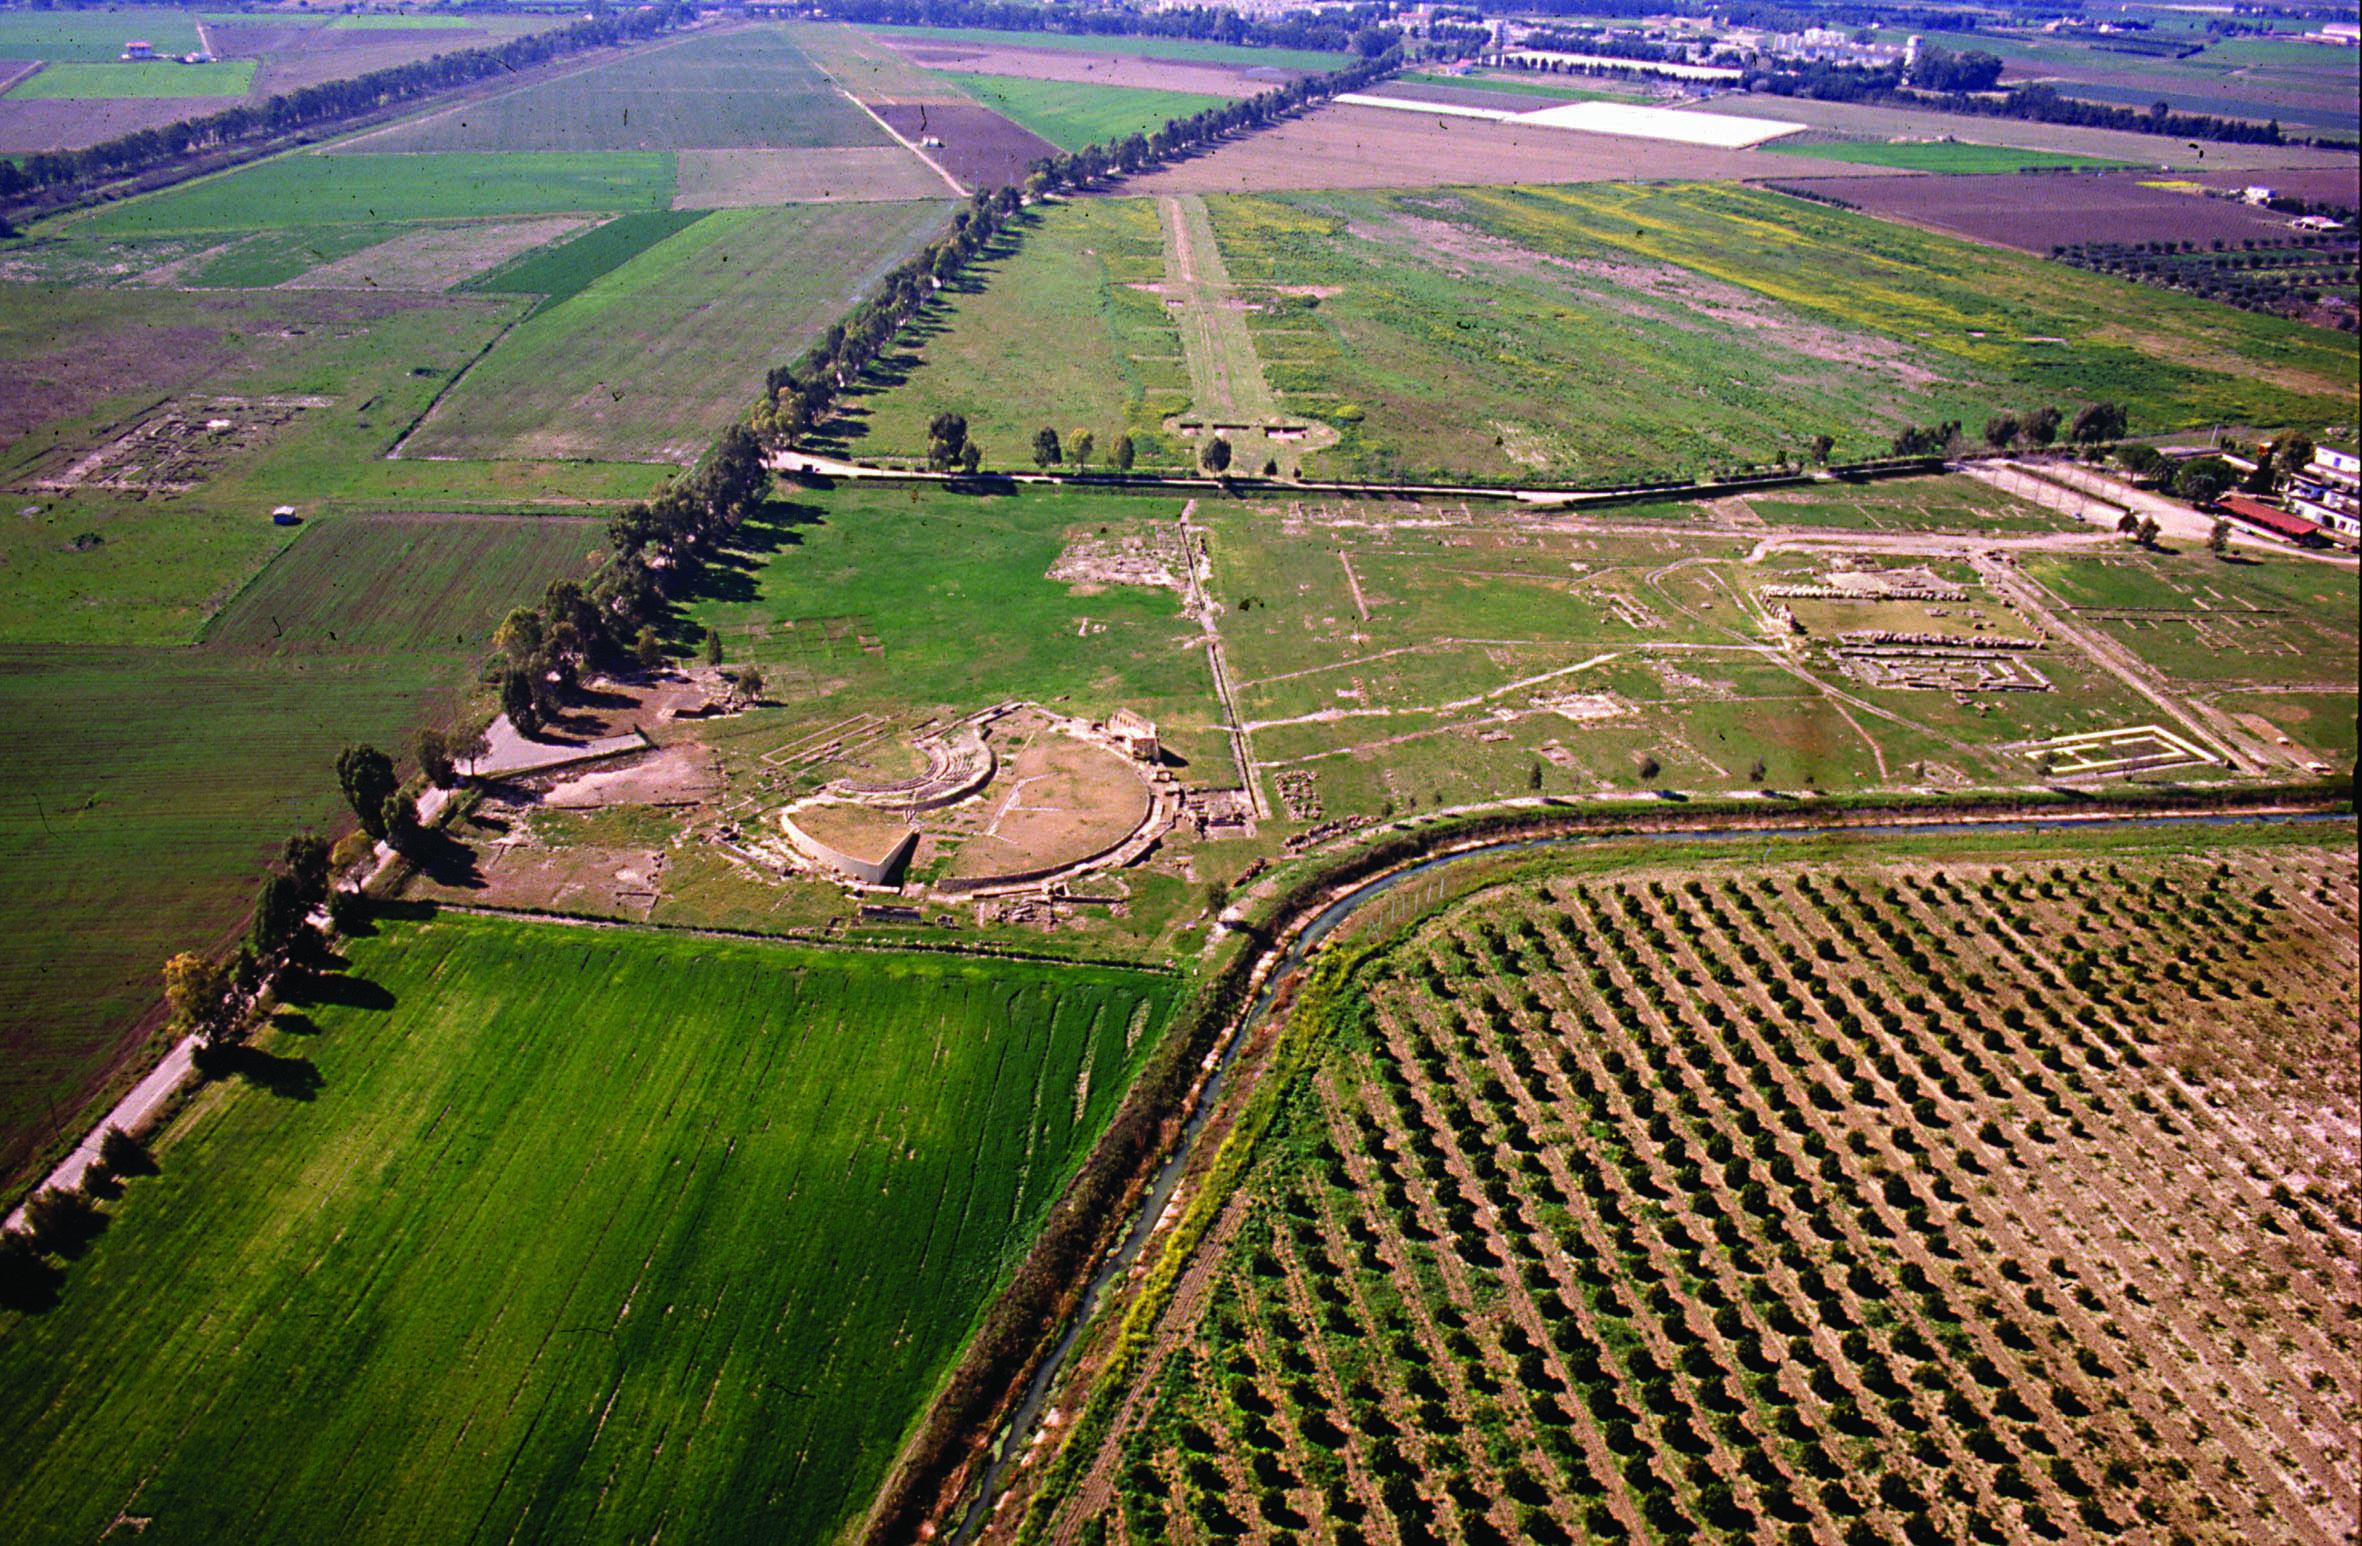 Presentazione Virtual Tour - Metaponto, Parco archeologico e Tavole Palatine